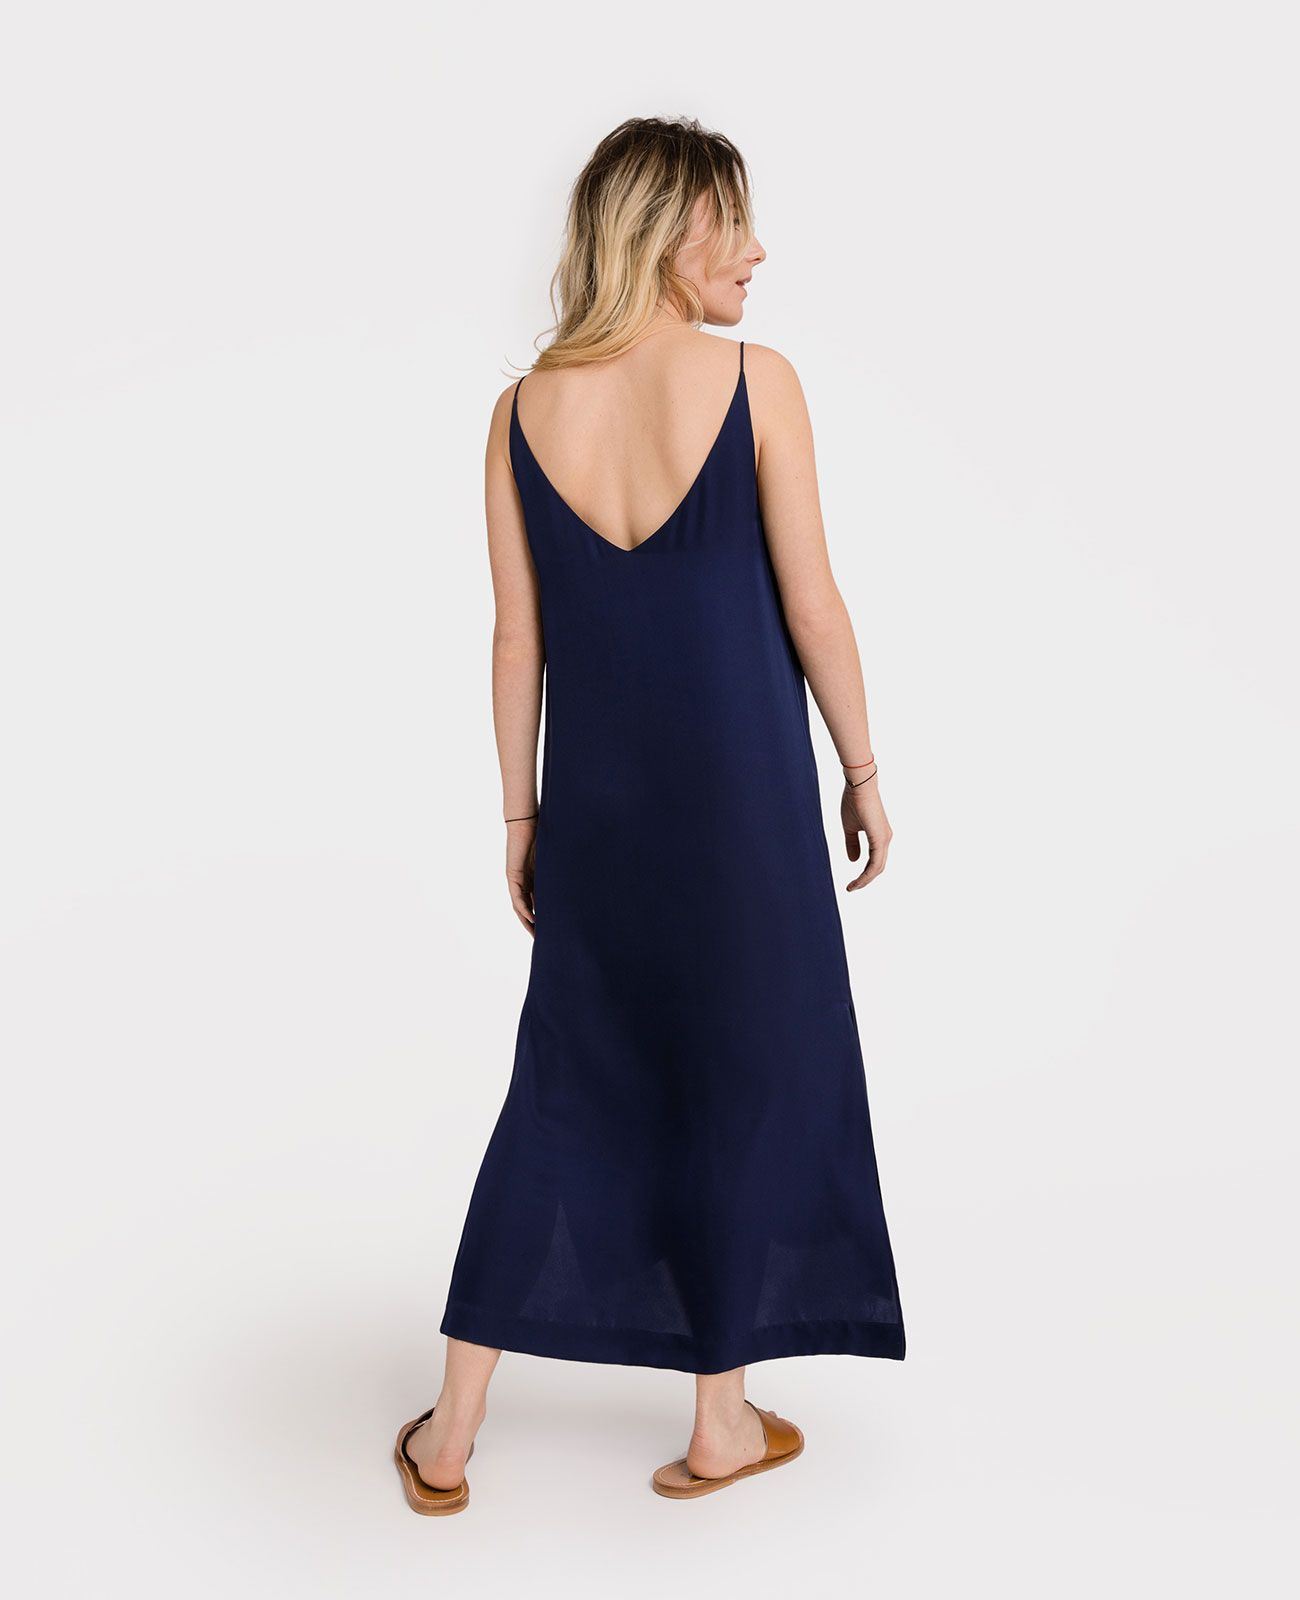 83c95cbc8edc Silk V-Neck Slip Dress in 2019   Inspiration   Fashion   Dresses ...